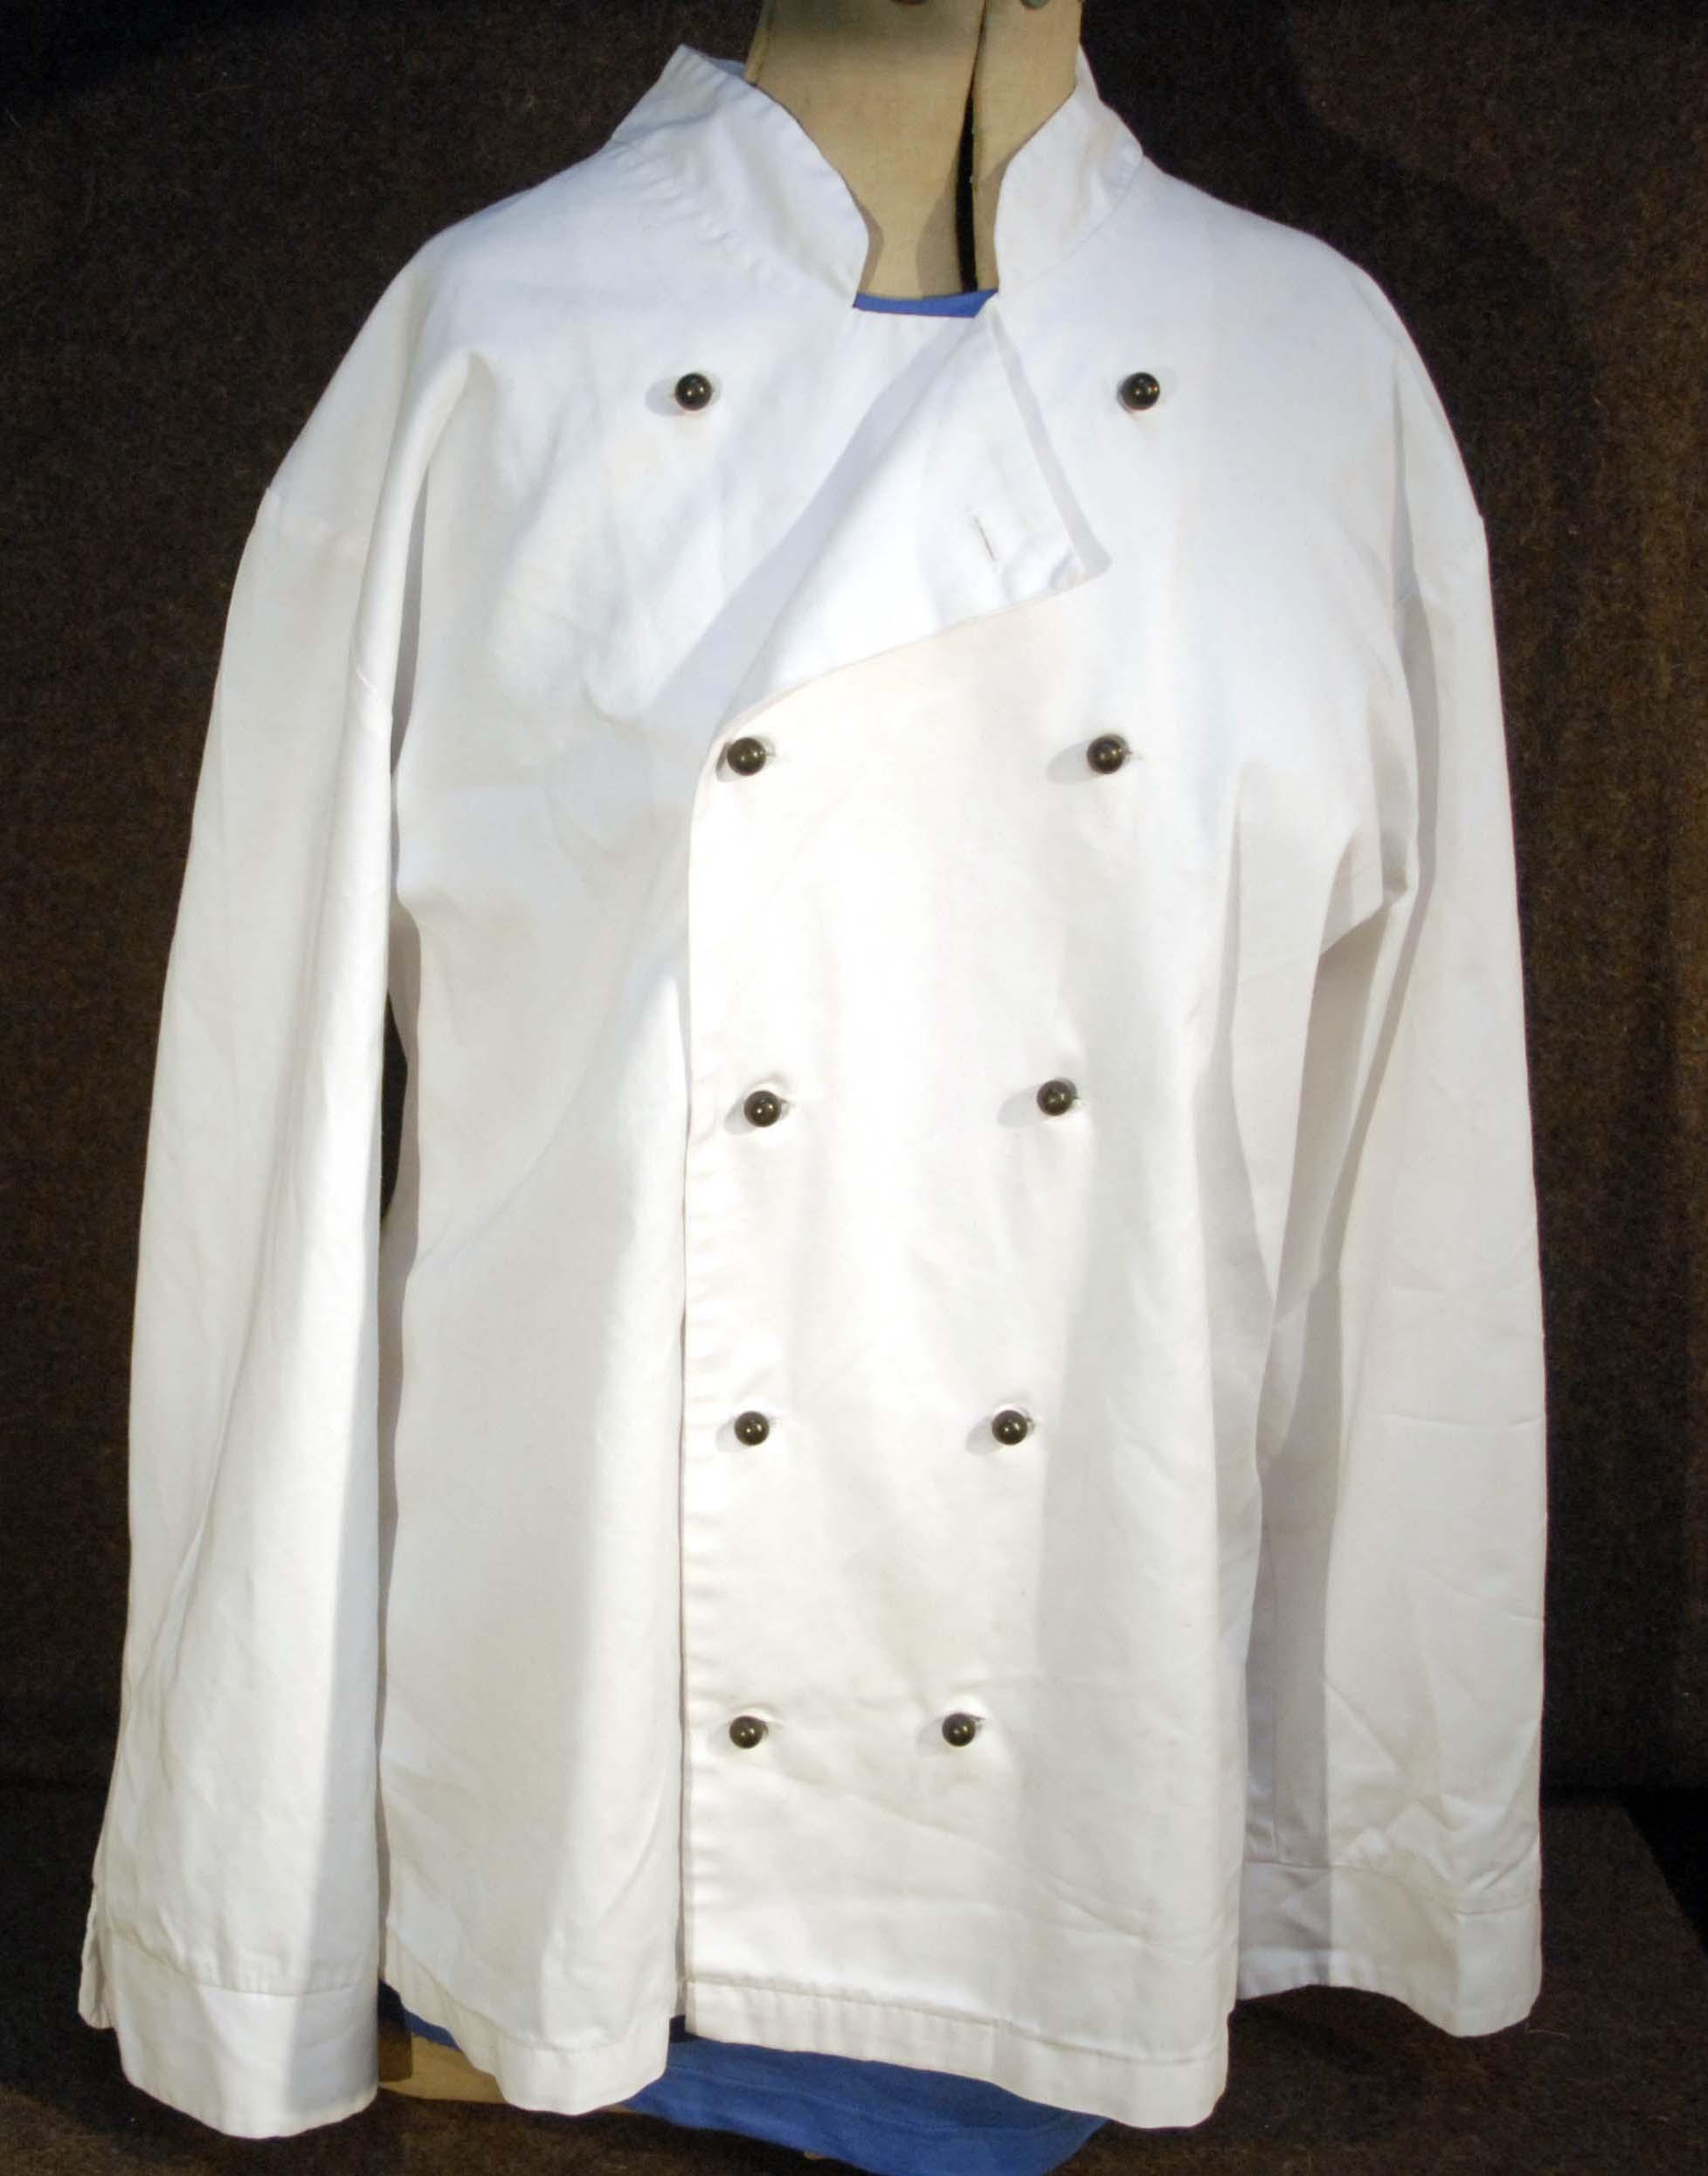 Us Army Chef Jacket Datei 1973 Pz Kpl Uniform Jpg